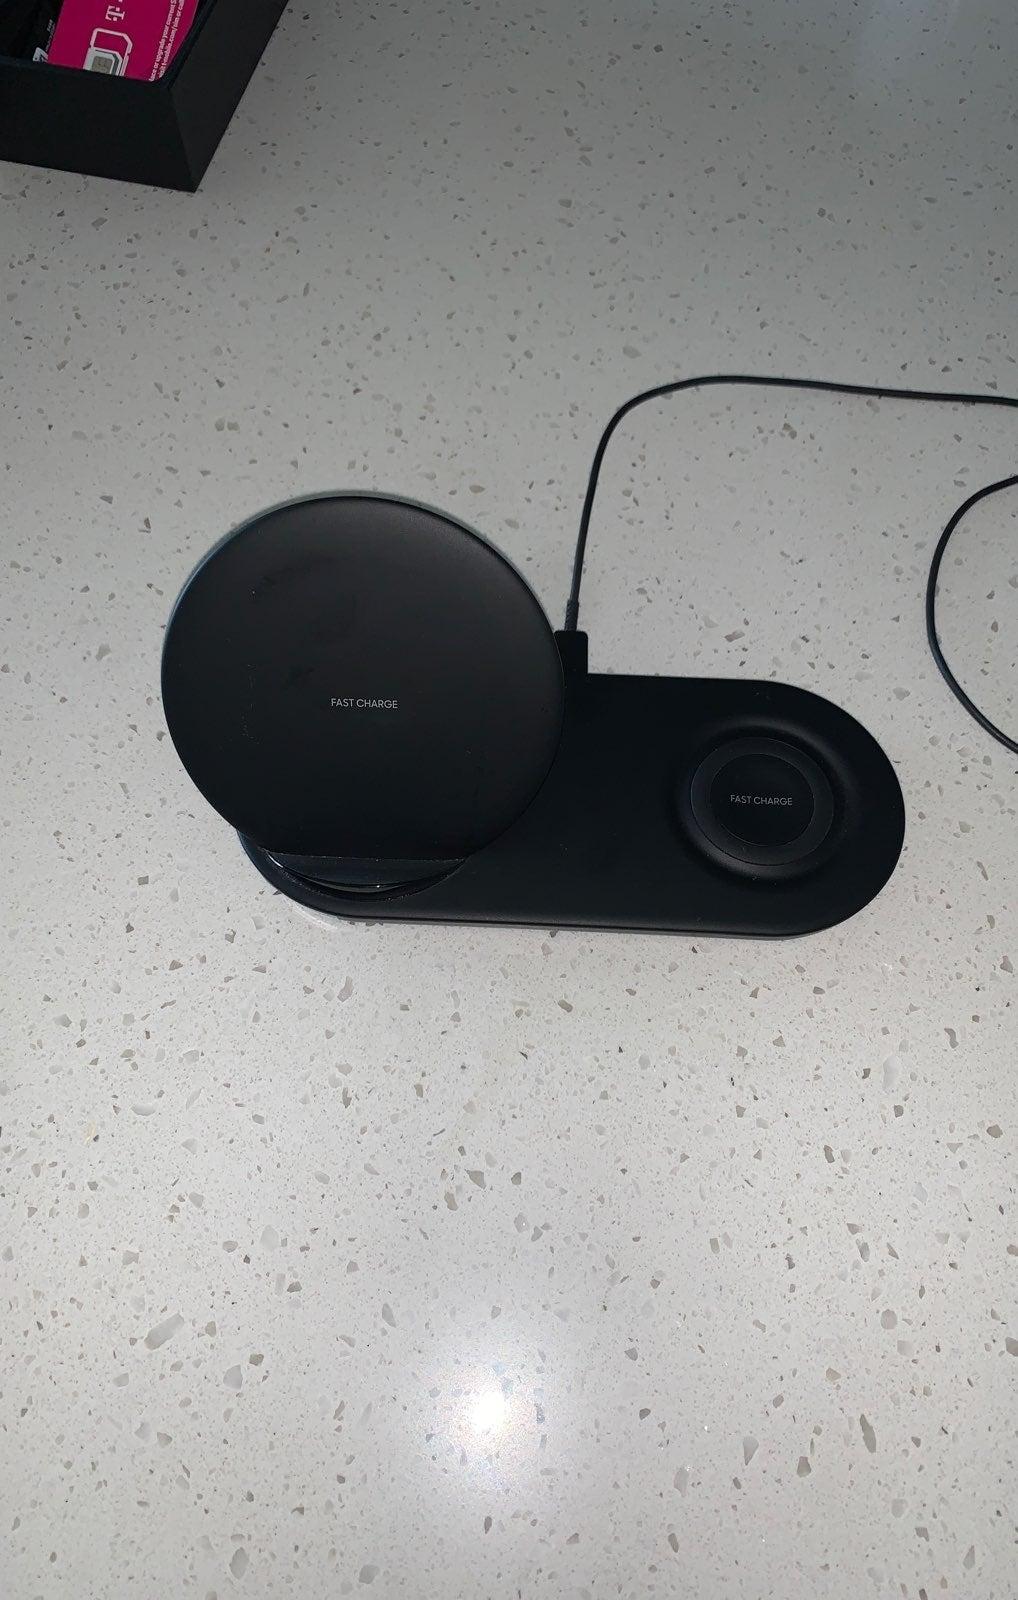 Samsung Dual Wireless Charging Dock